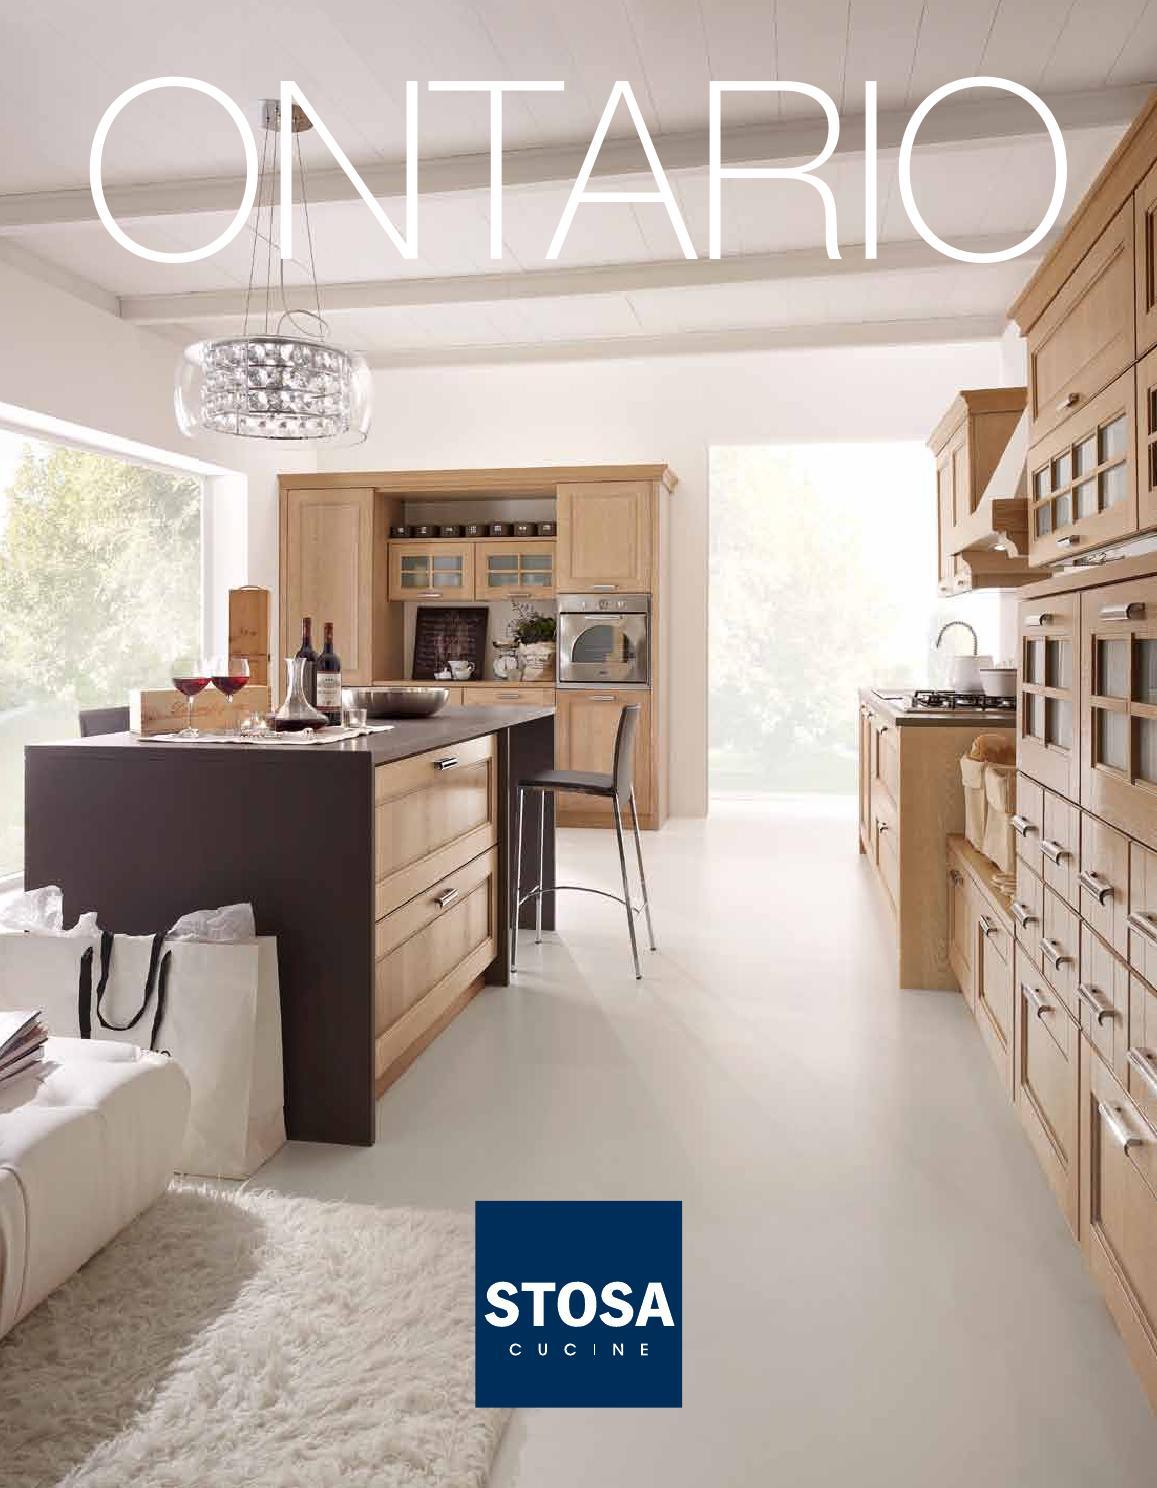 Stosa Cucine Contemporanee   Ontario by Irina Medvedeva - issuu